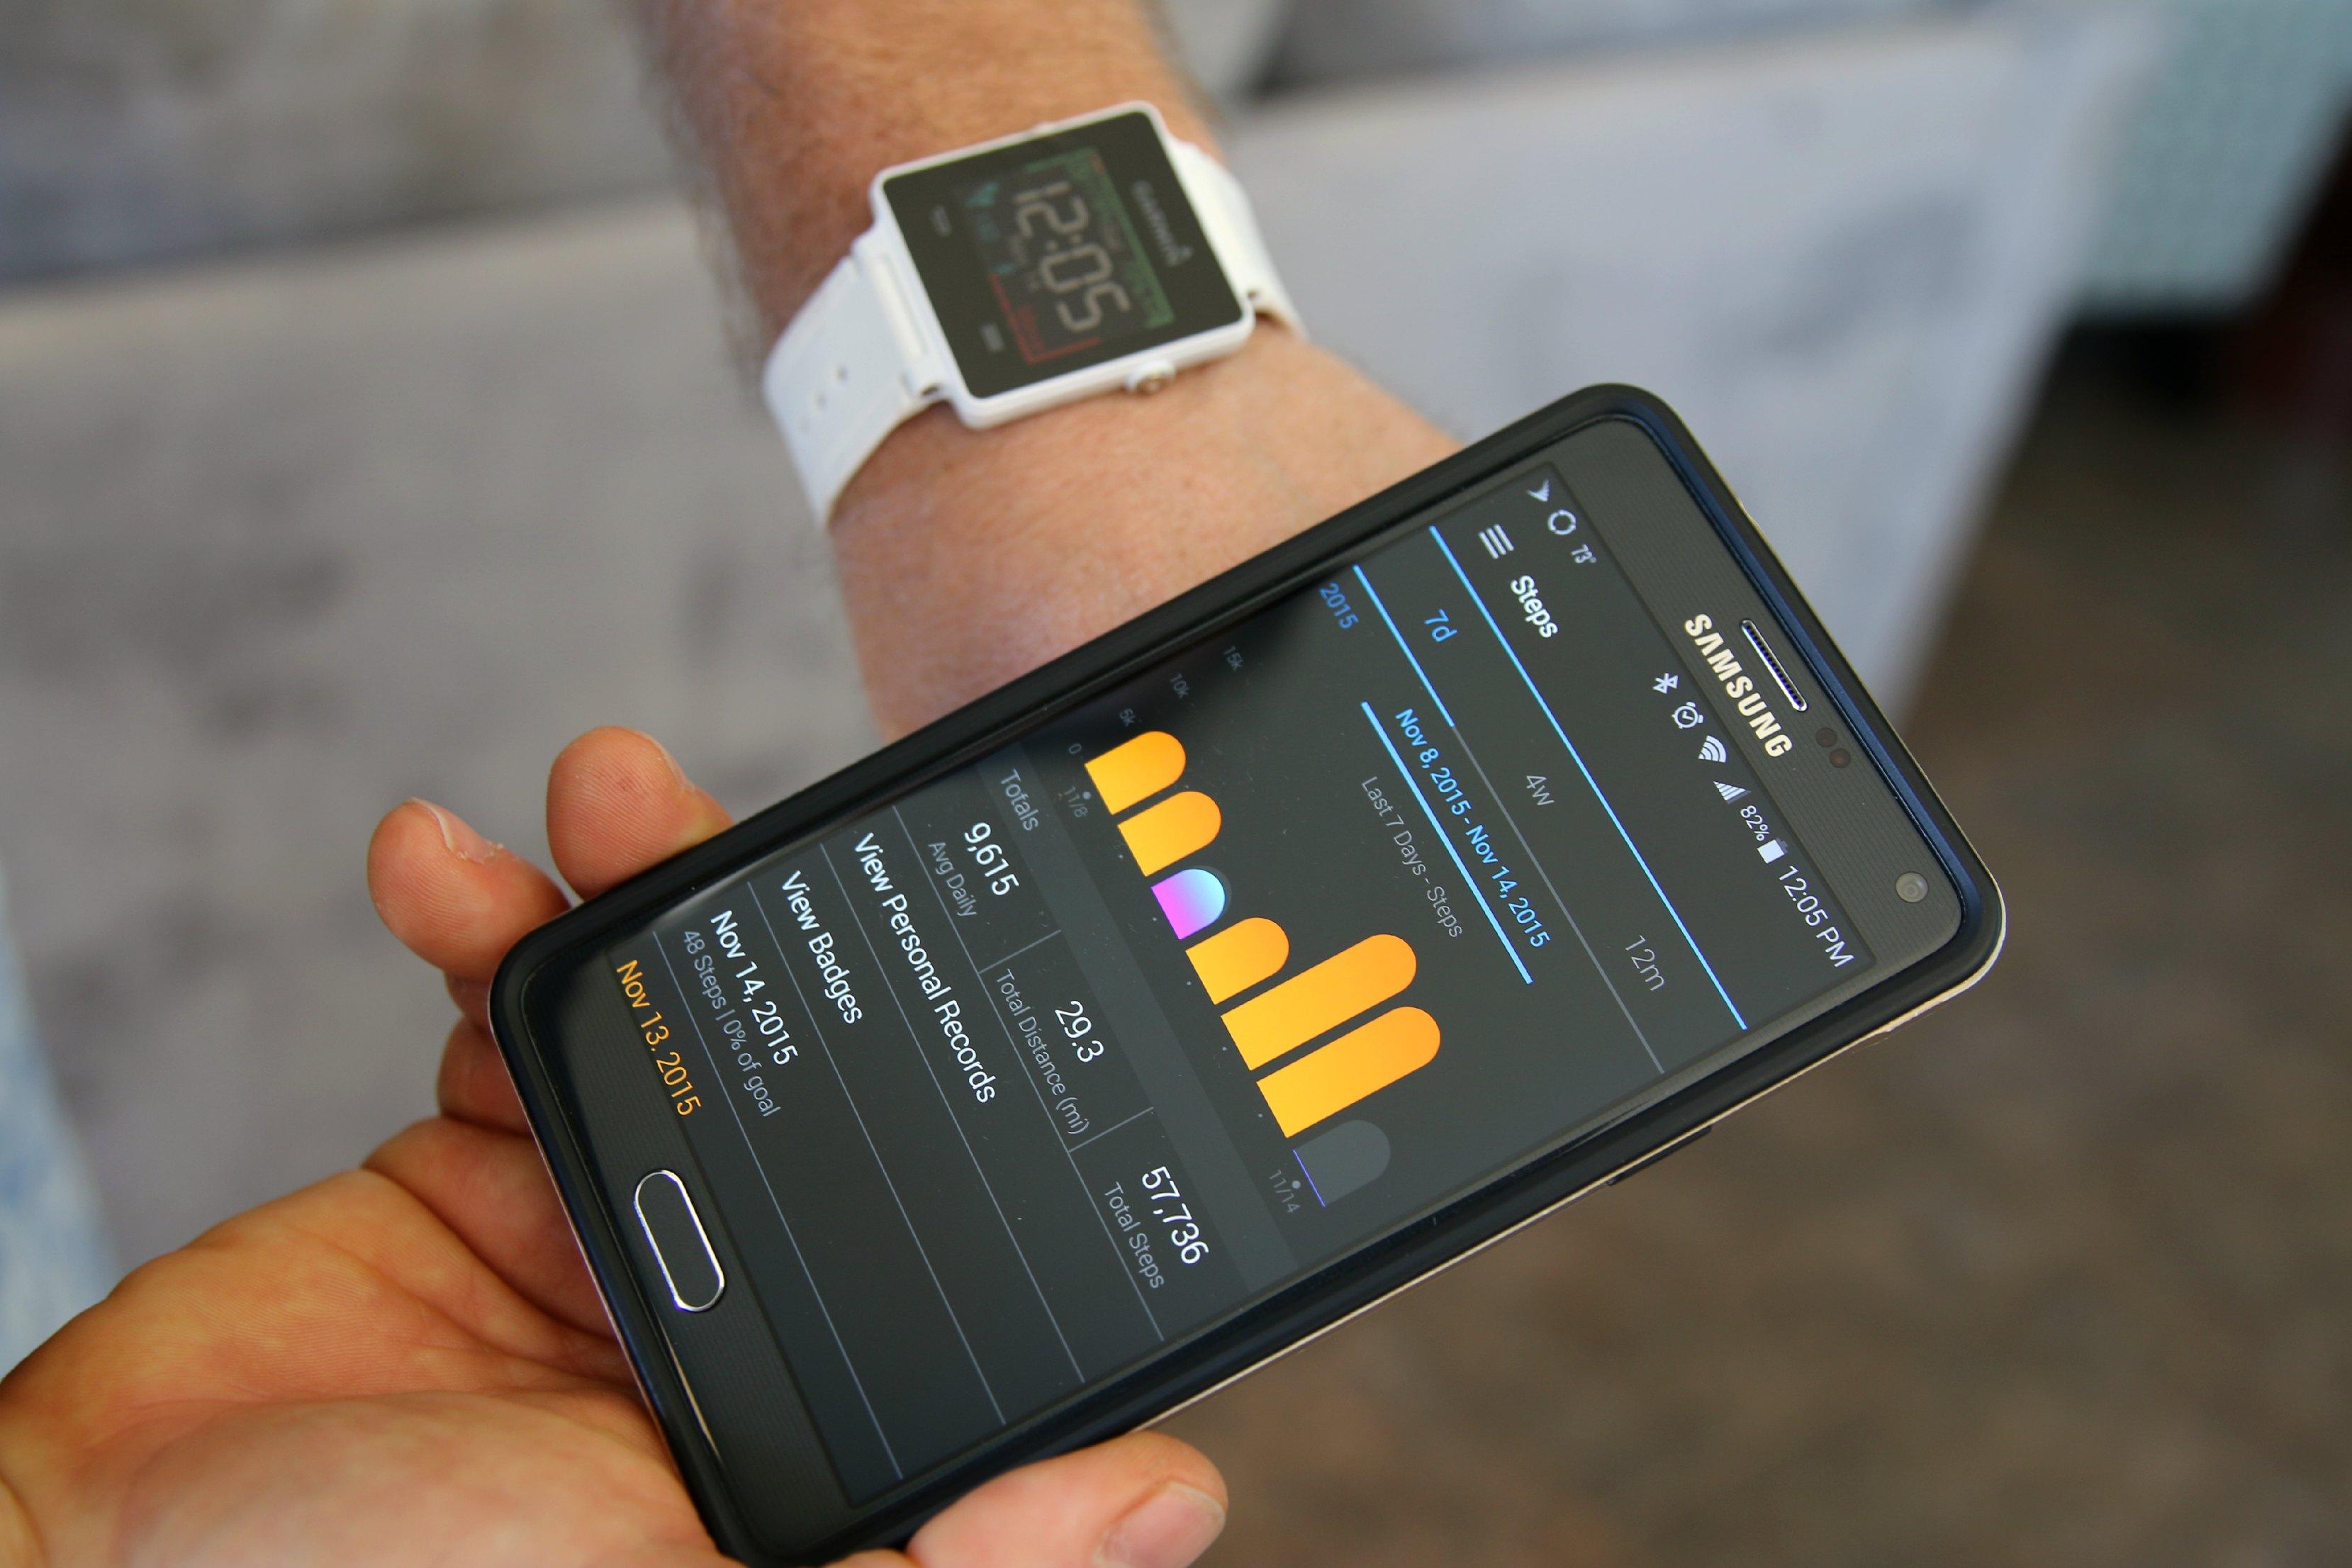 garmin fitness tracker review